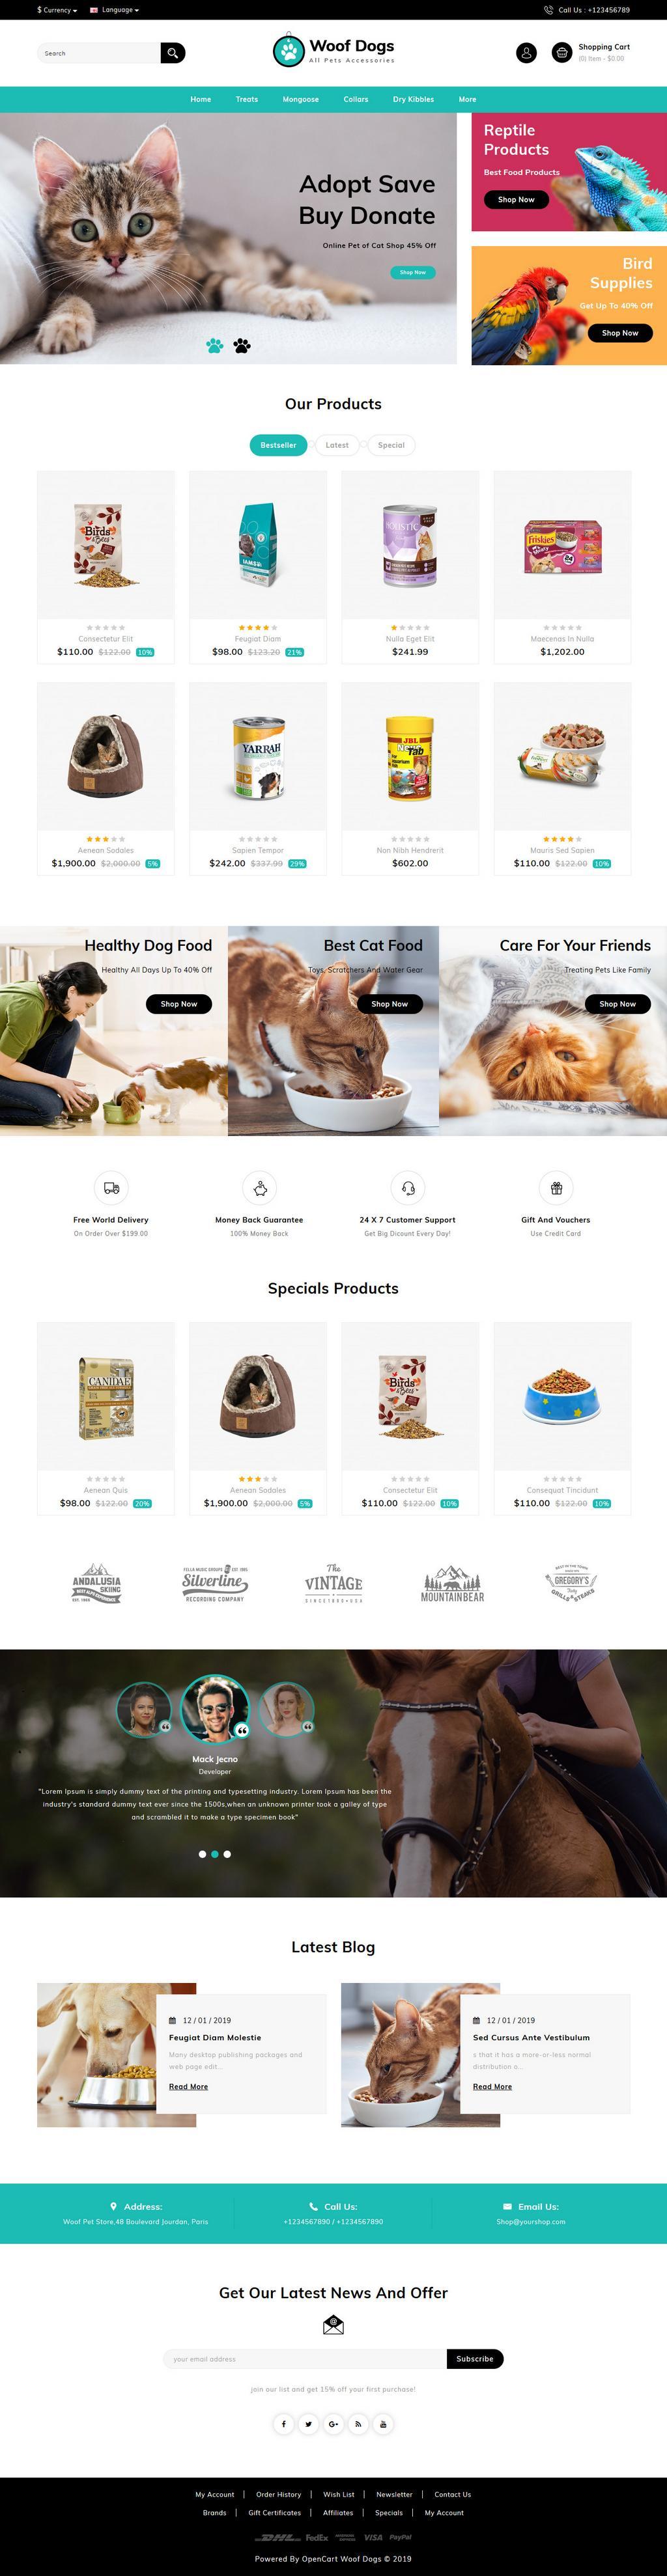 Woofdog Opencart Theme - AVJ Themes